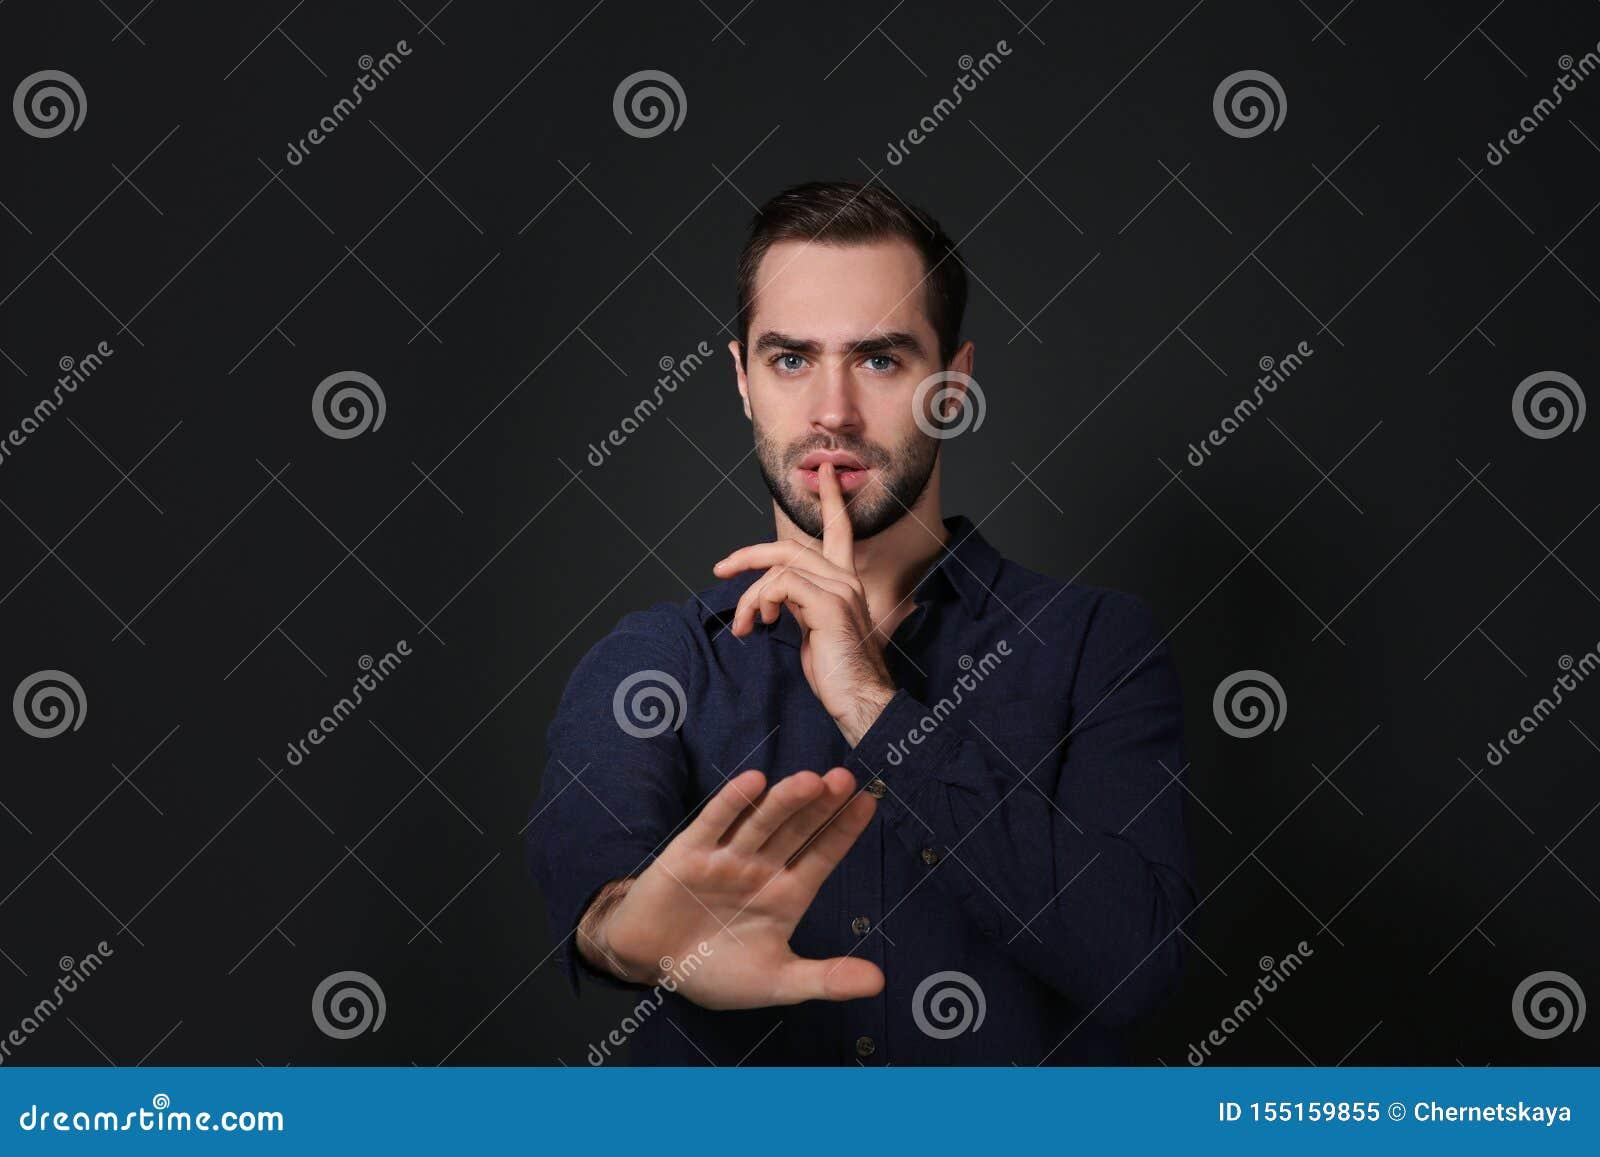 Man showing HUSH gesture in sign language on black